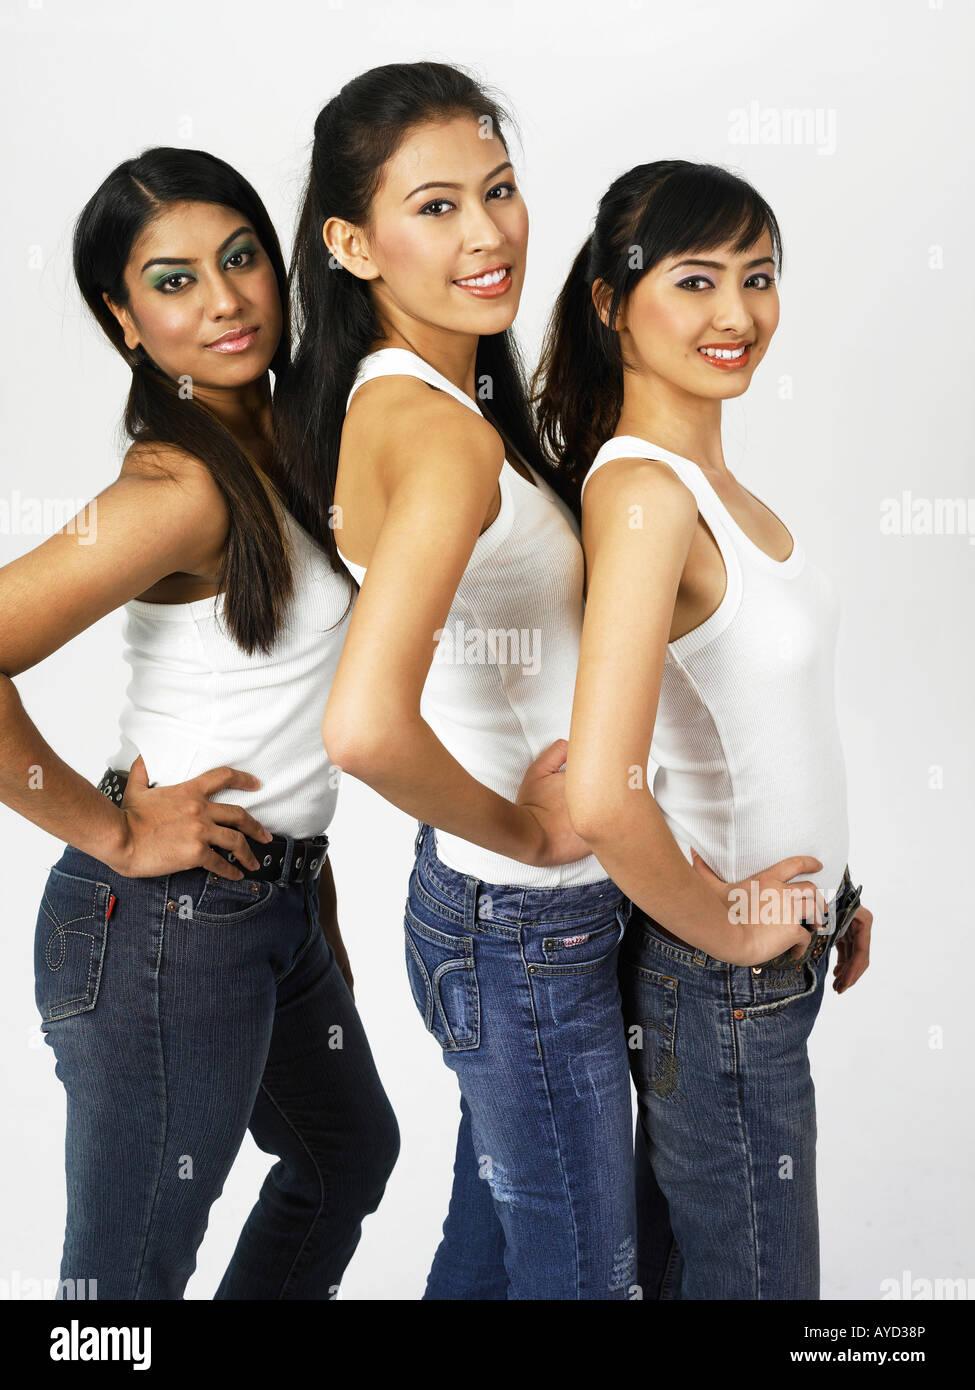 Vista lateral de tres mujeres Imagen De Stock